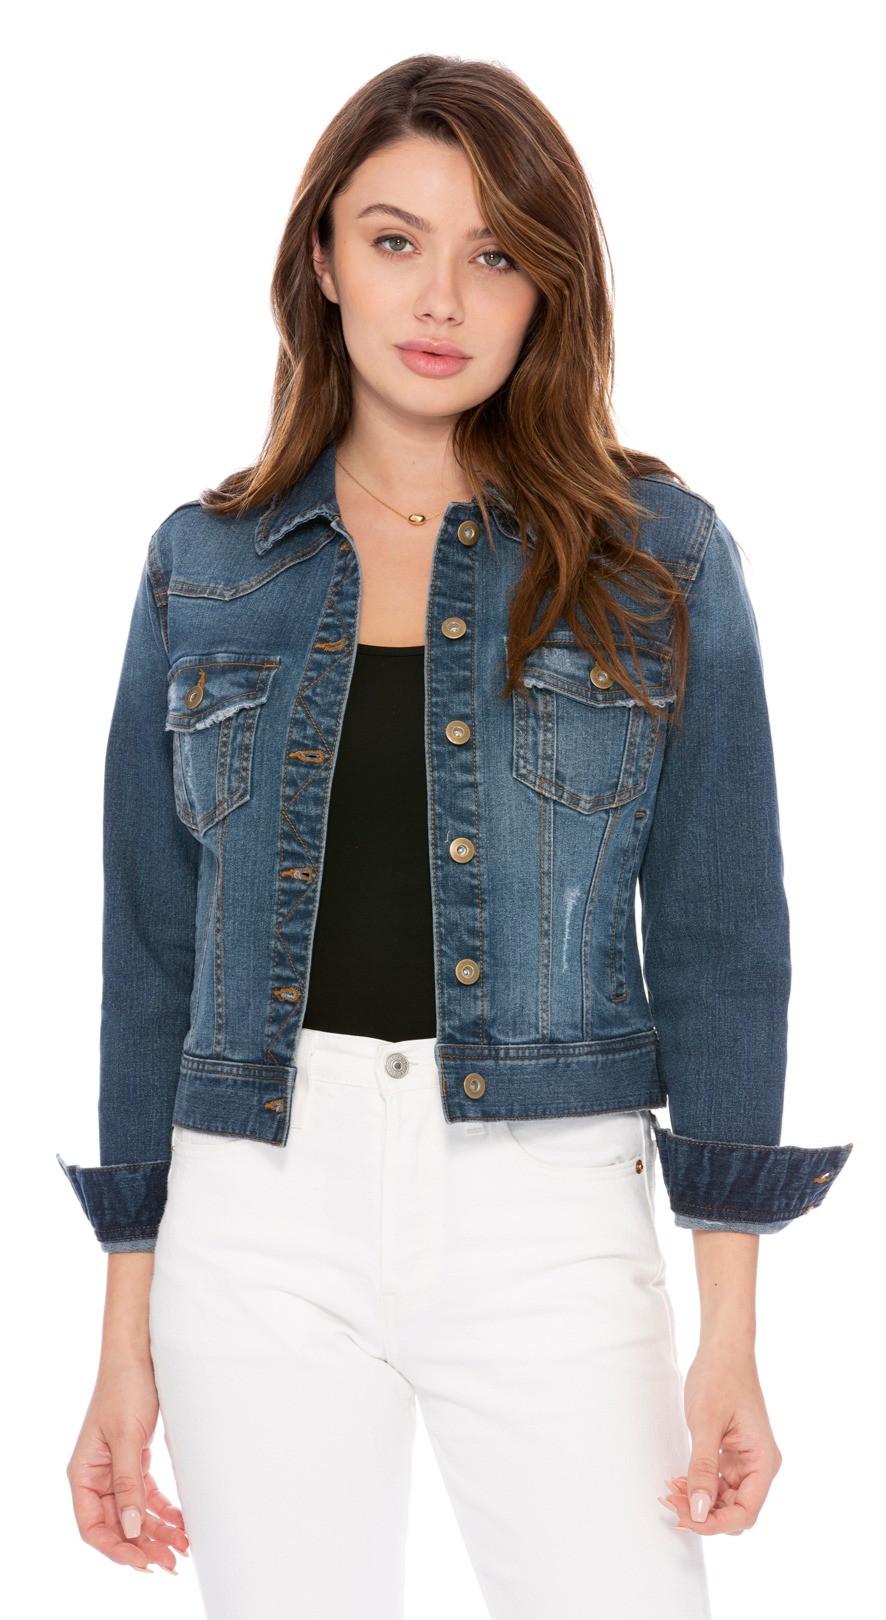 Classic Medium Blue Wash Distressed Denim Jacket